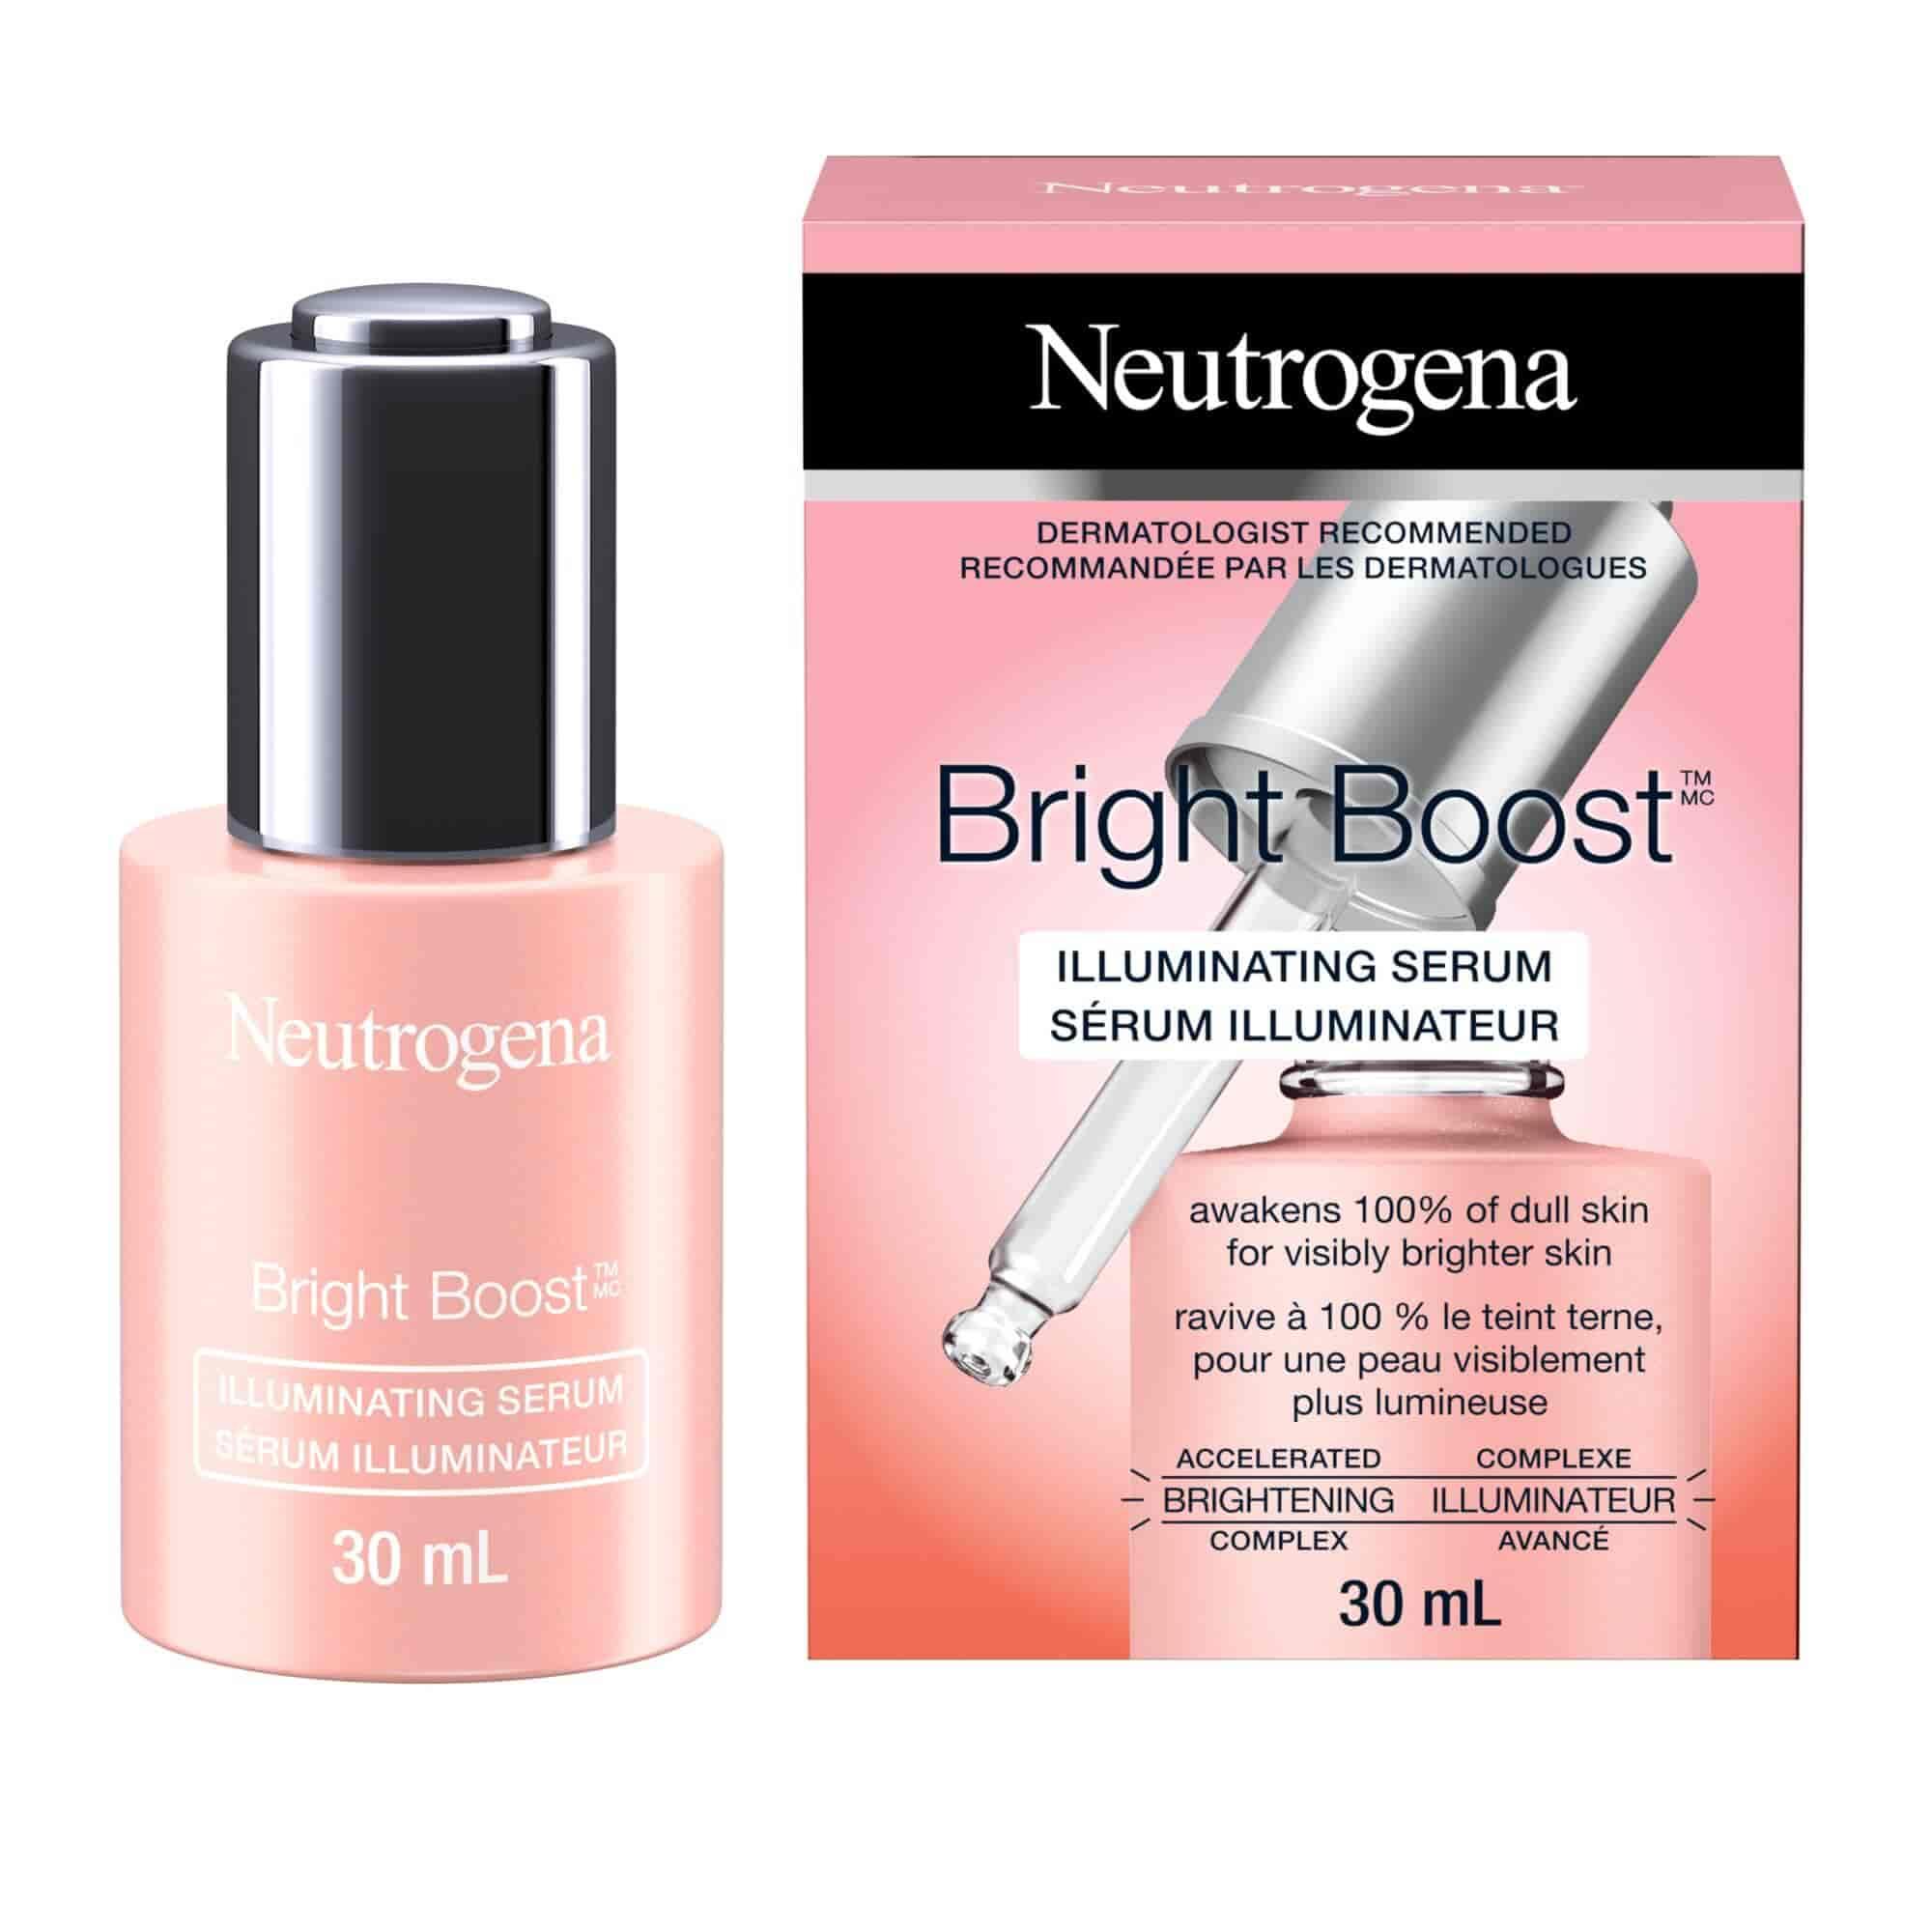 Neutrogena Bright Boost™ Illuminating Serum, 30 ml